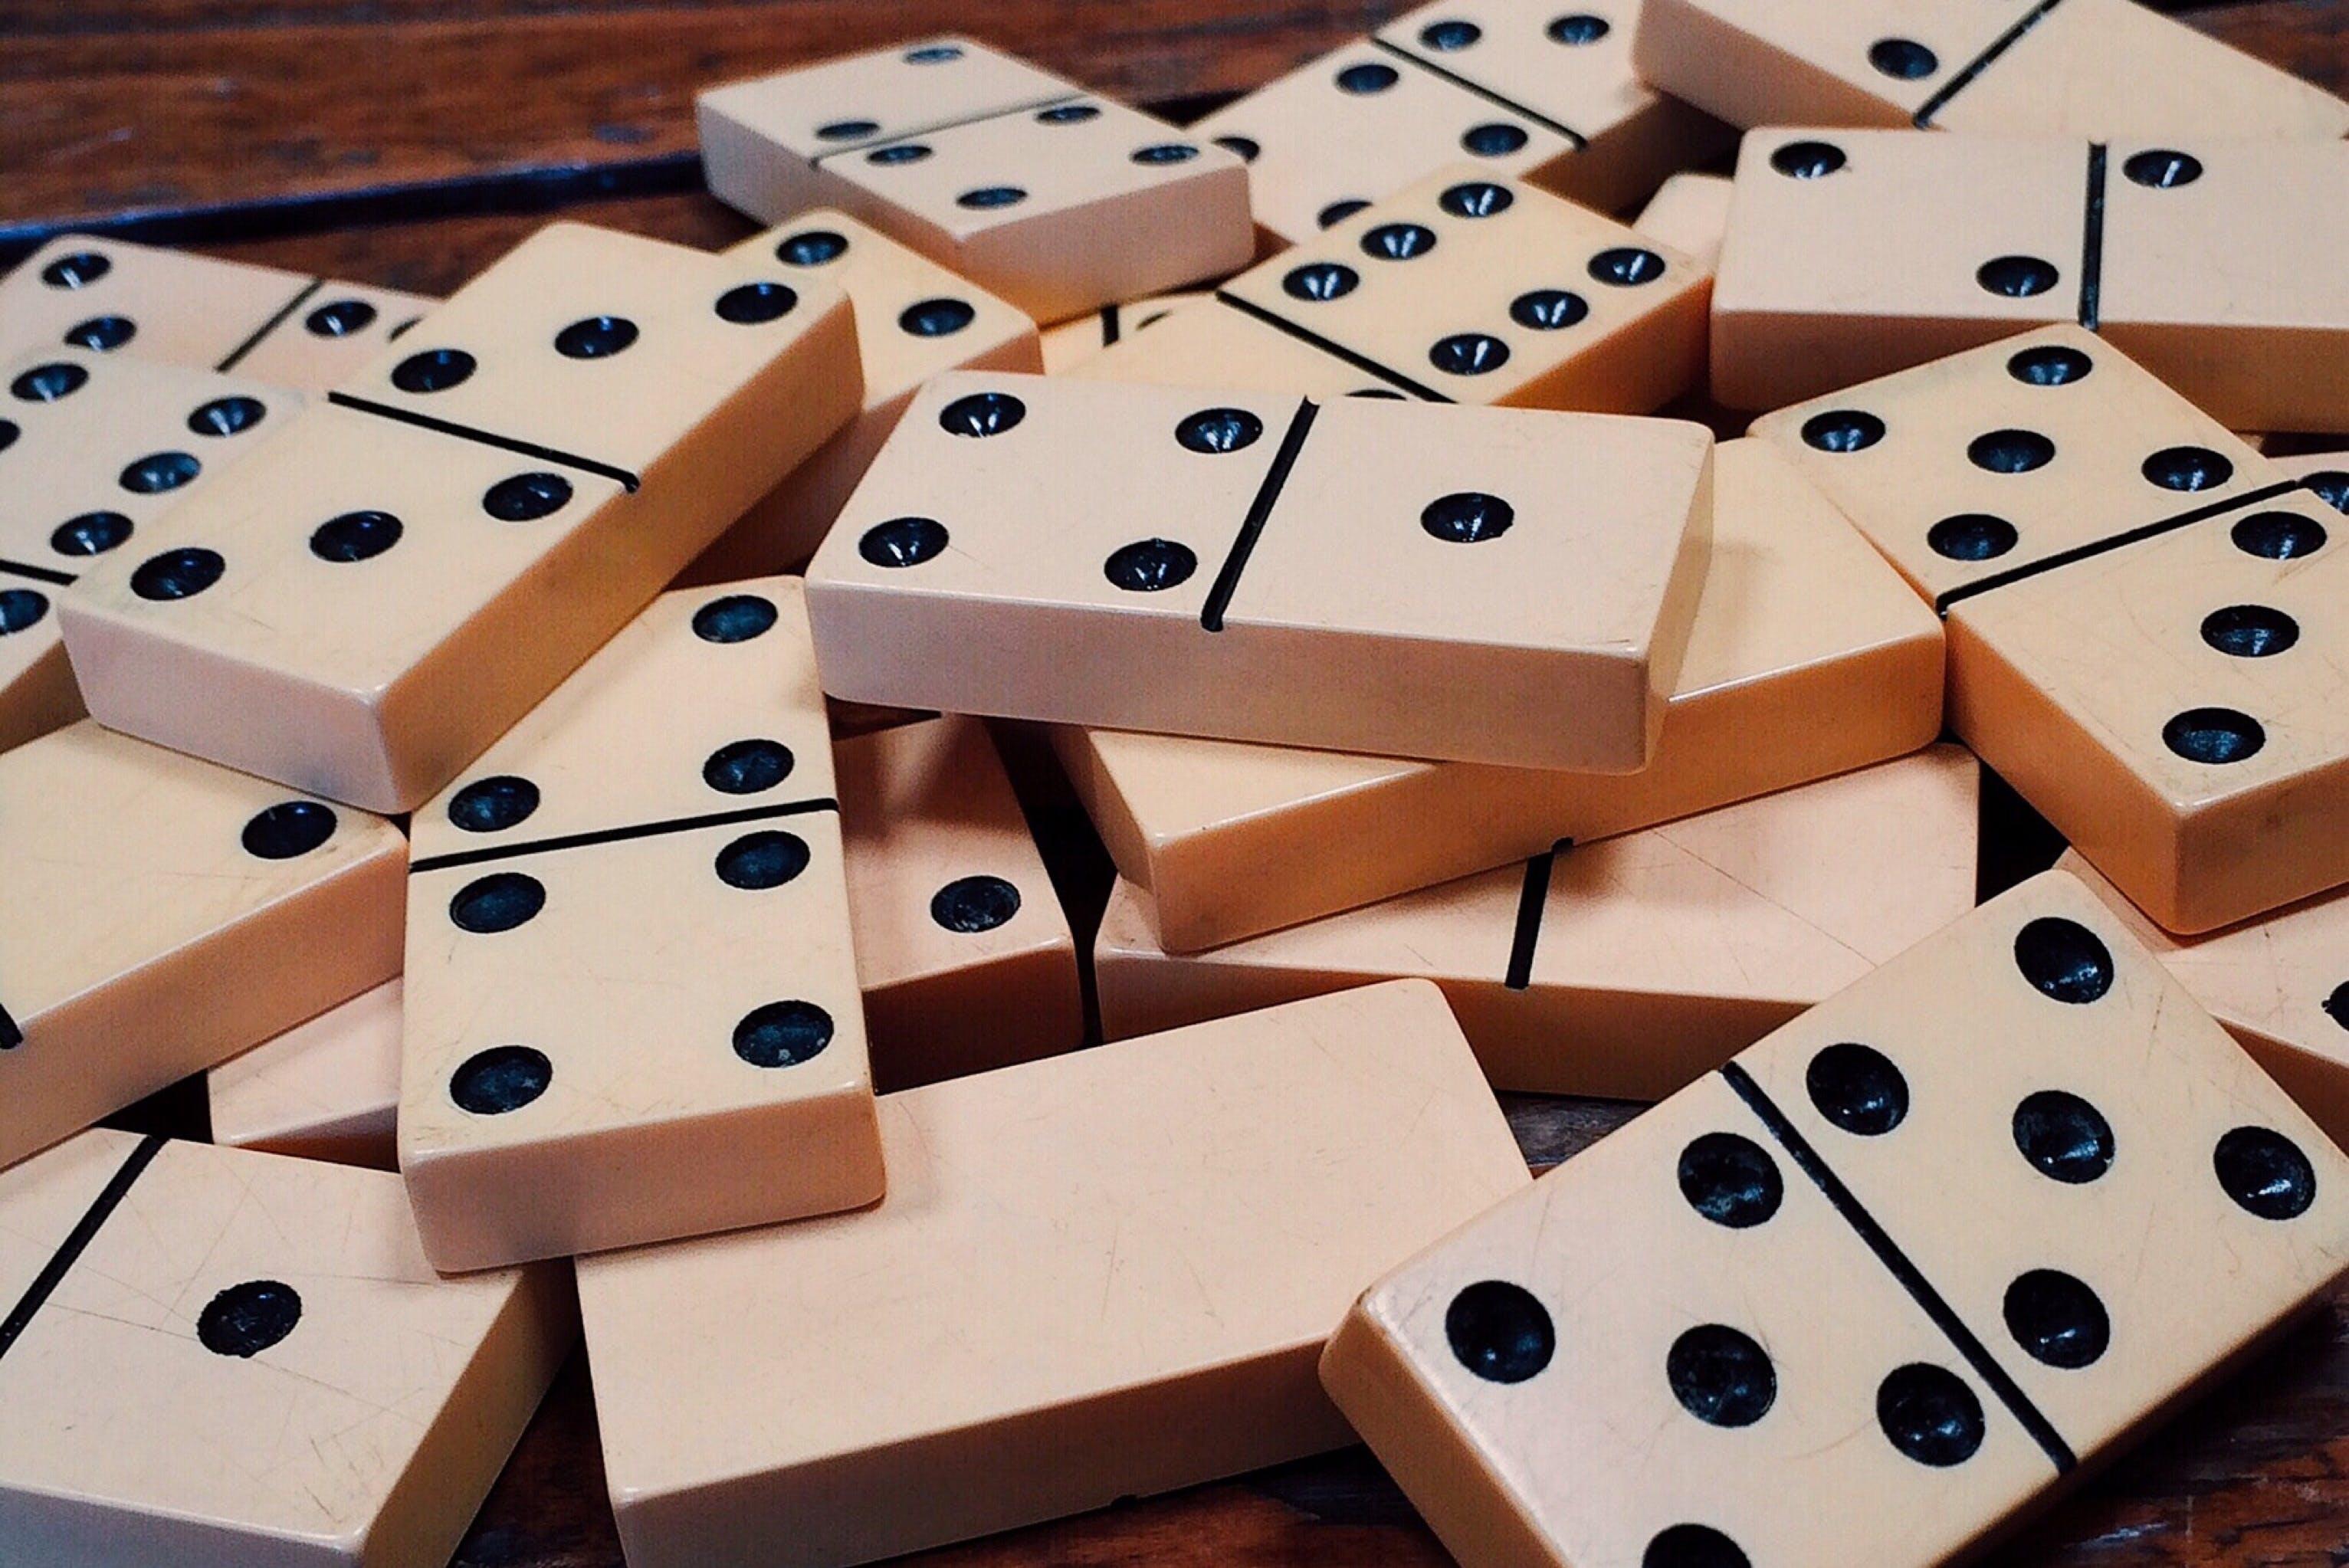 addiction, deck, dominoes